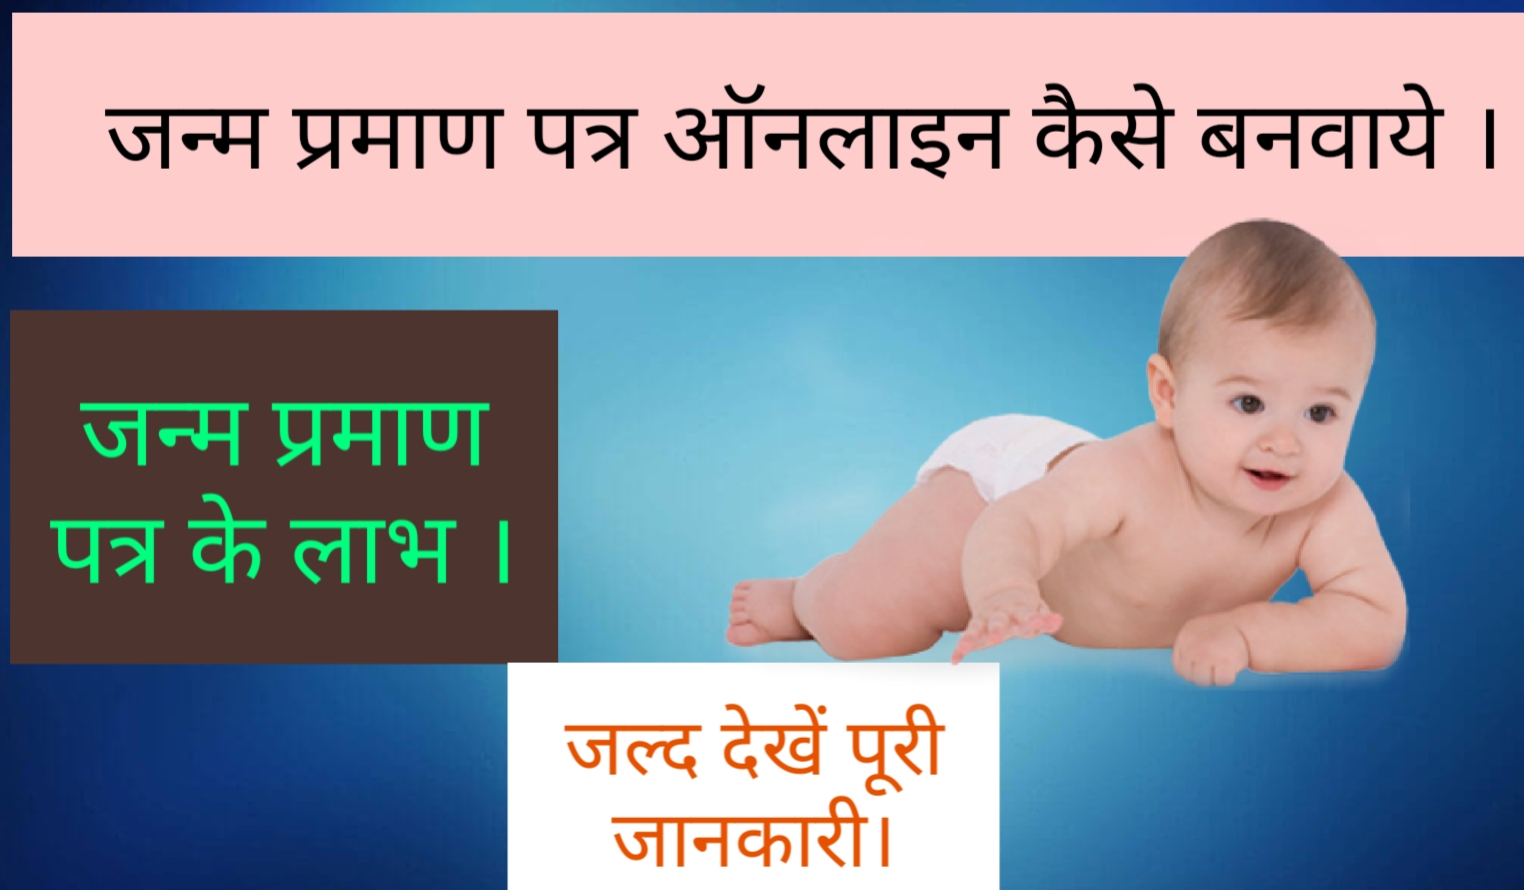 Rajasthan Janam Praman Patra | राजस्थान जन्म प्रमाण पत्र ऑनलाइन आवेदन | एप्लीकेशन फॉर्म